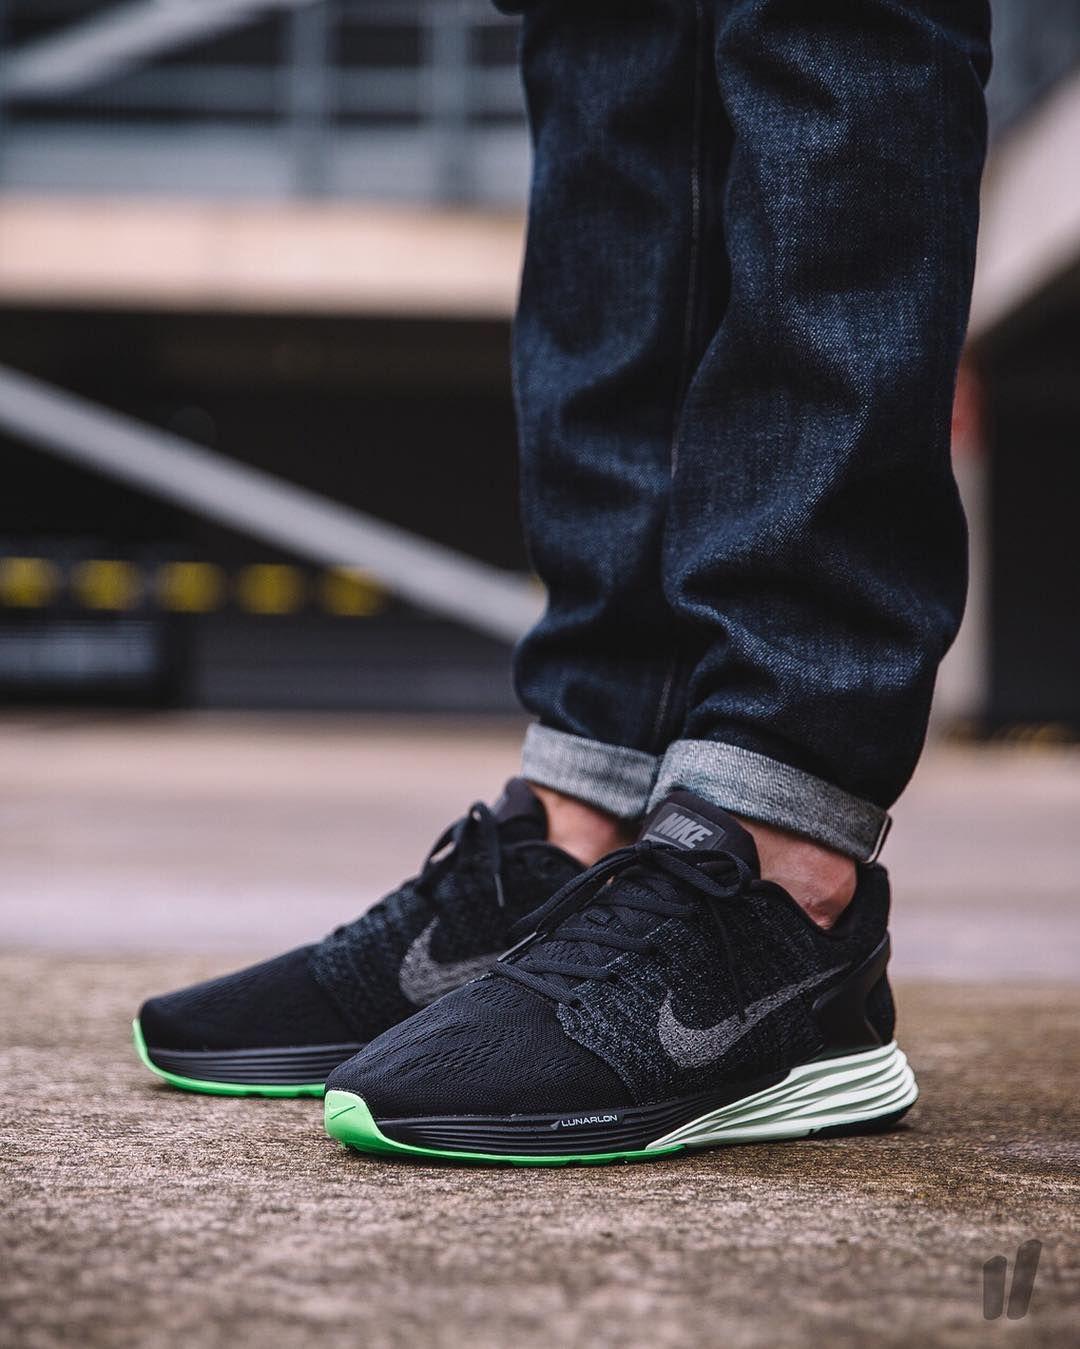 sports shoes 41cc5 92294 australia instagram nike lunarglide 7 lb 4be96 8c4f4